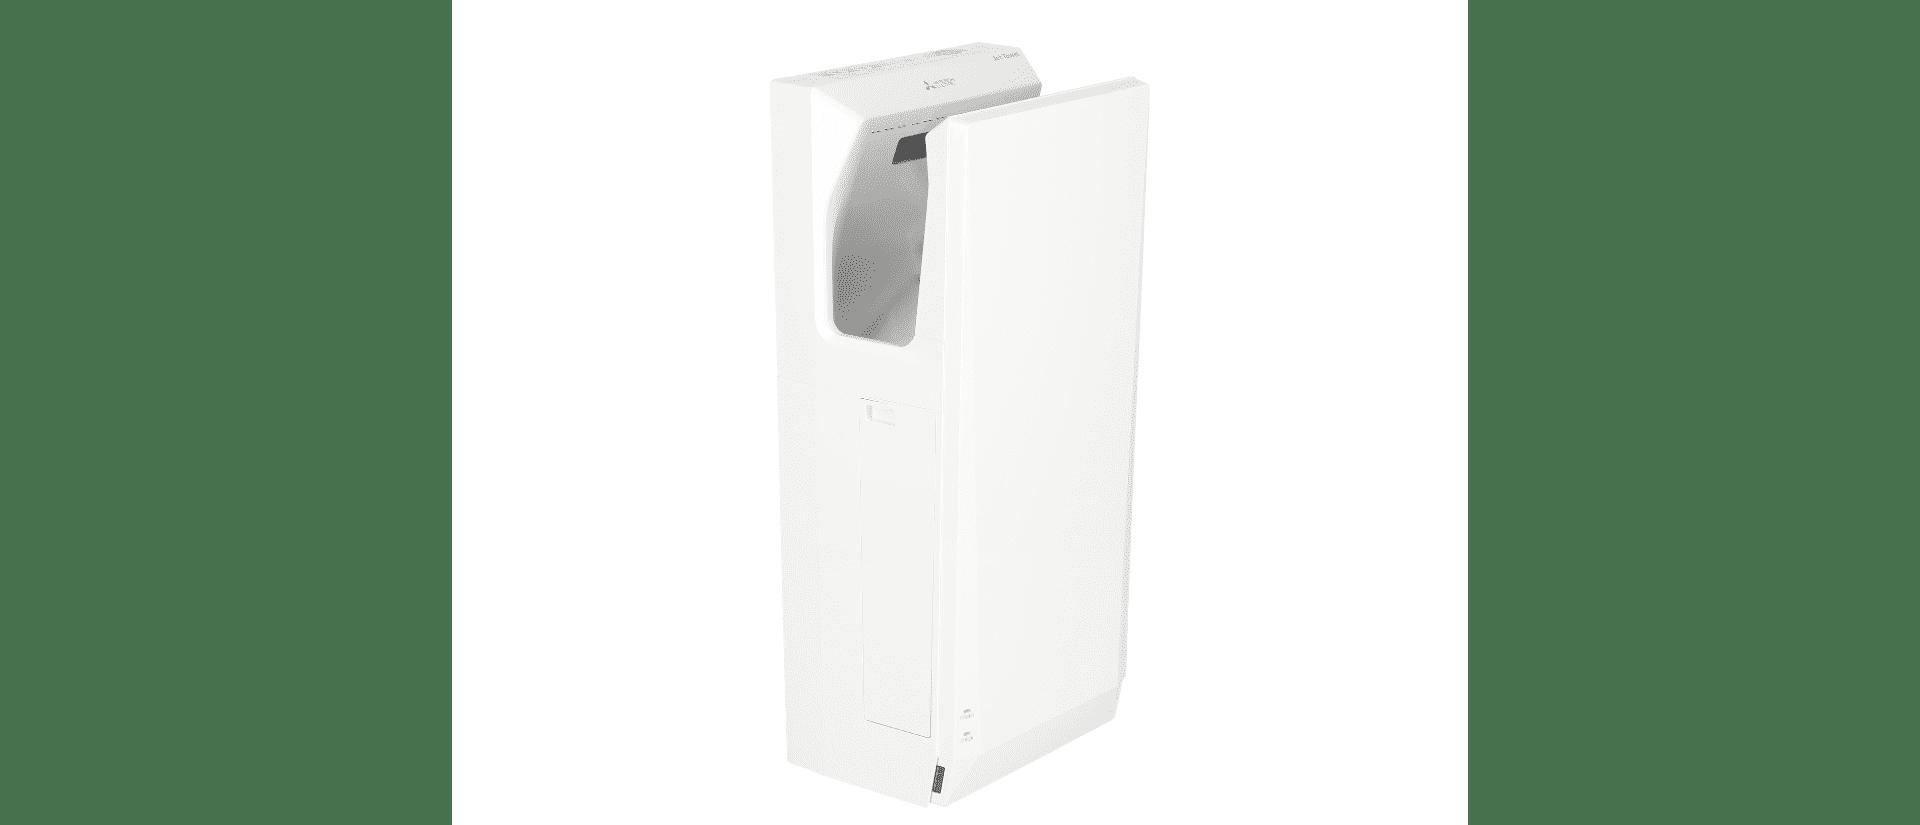 Mitsubishi Hand Dryer Jet Towel Heated White Janitorial